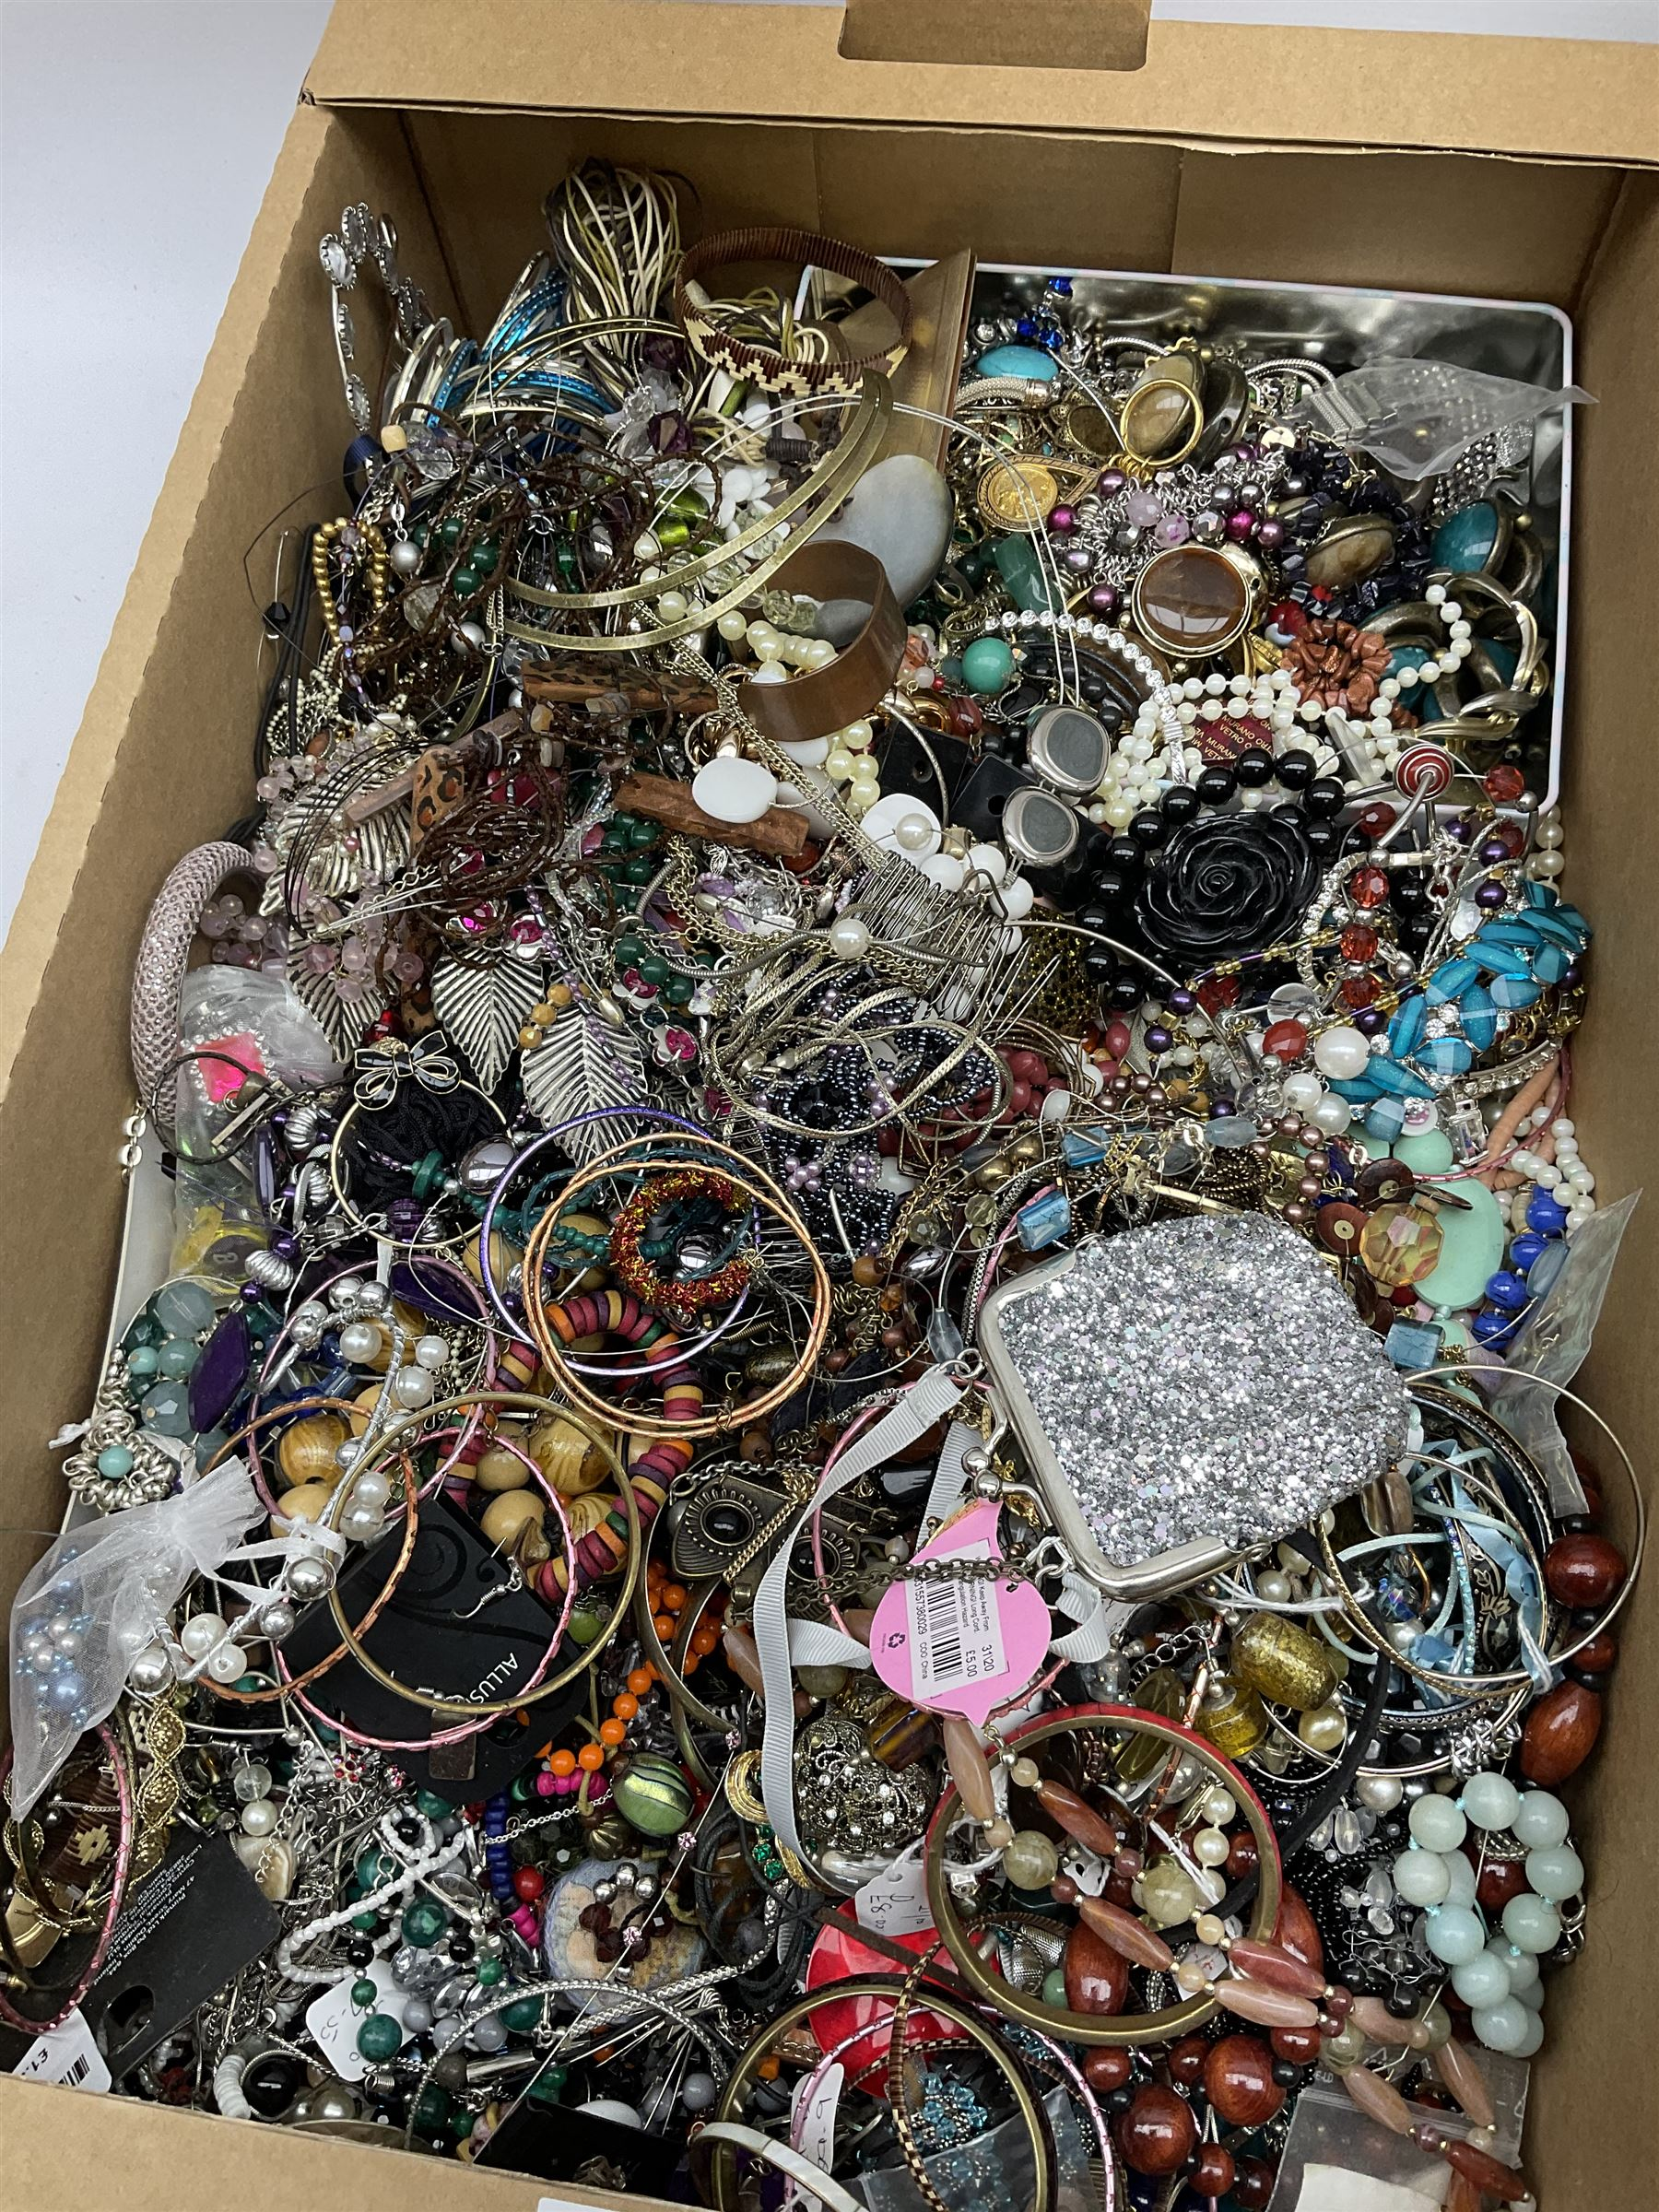 Quantity of costume jewellery including bracelets - Image 2 of 4